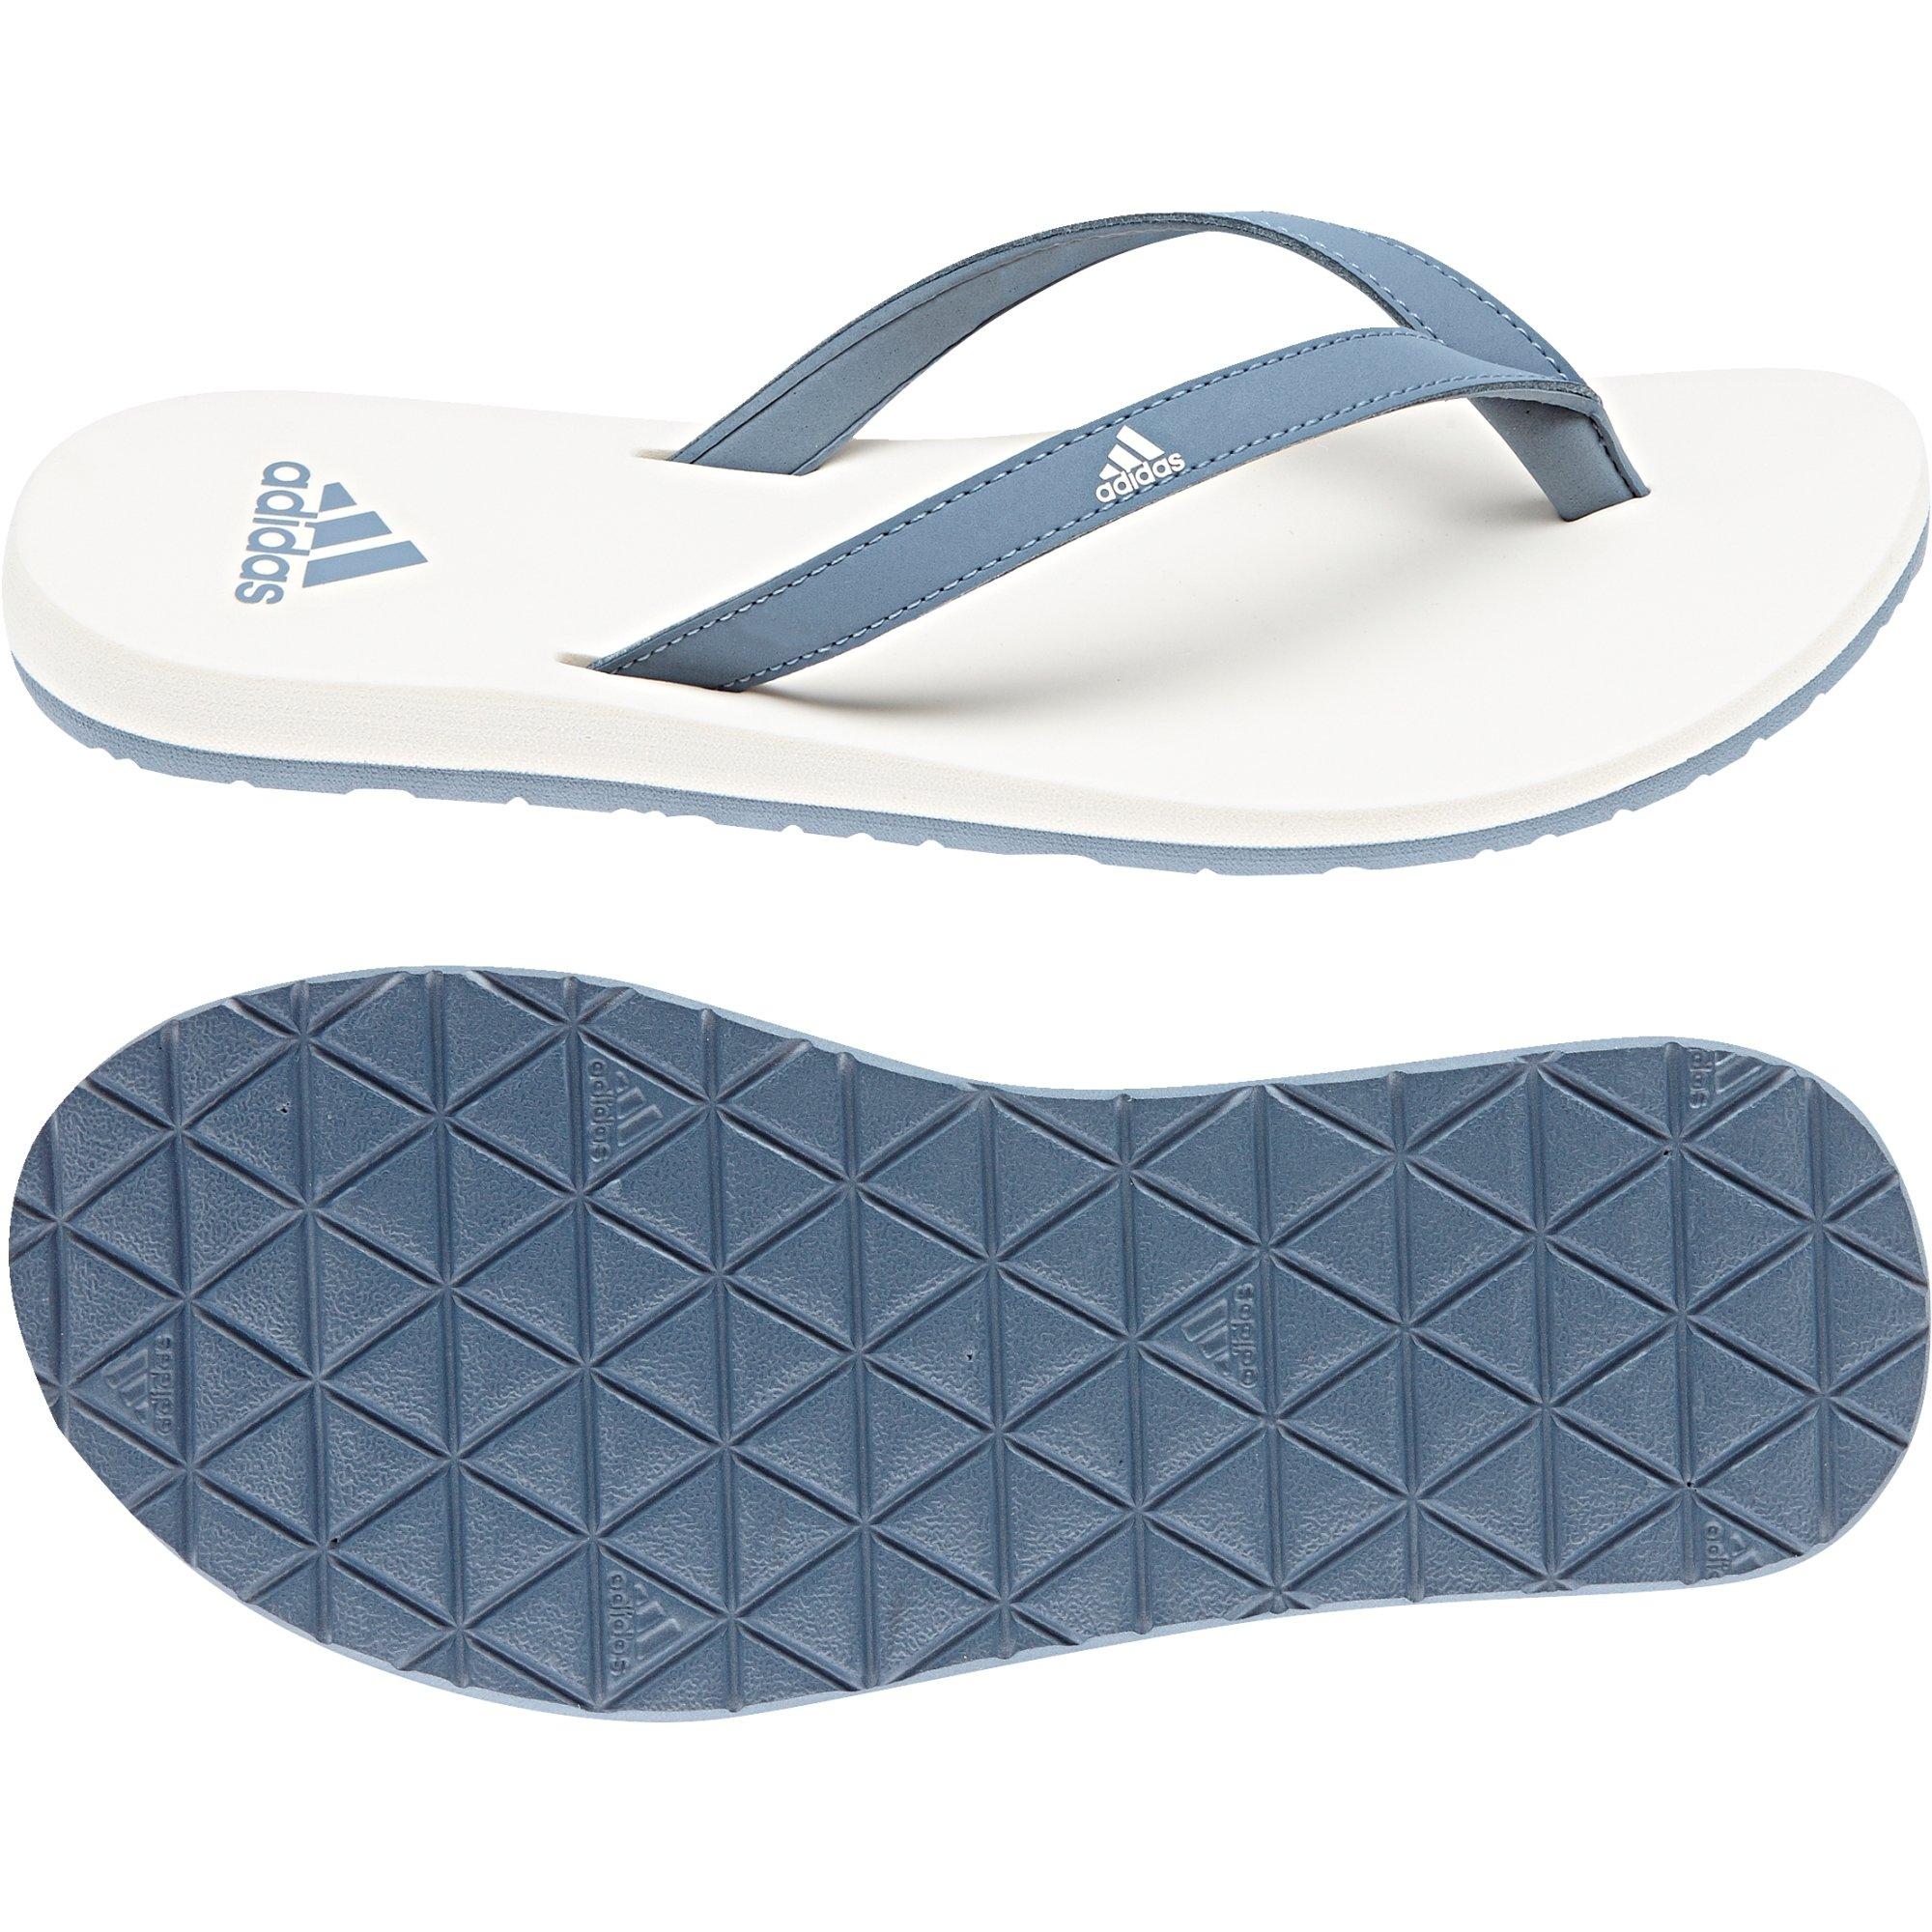 save off c6eaf c6f01 adidas japonki damskie EEZAY ESSENCE niebieski 42